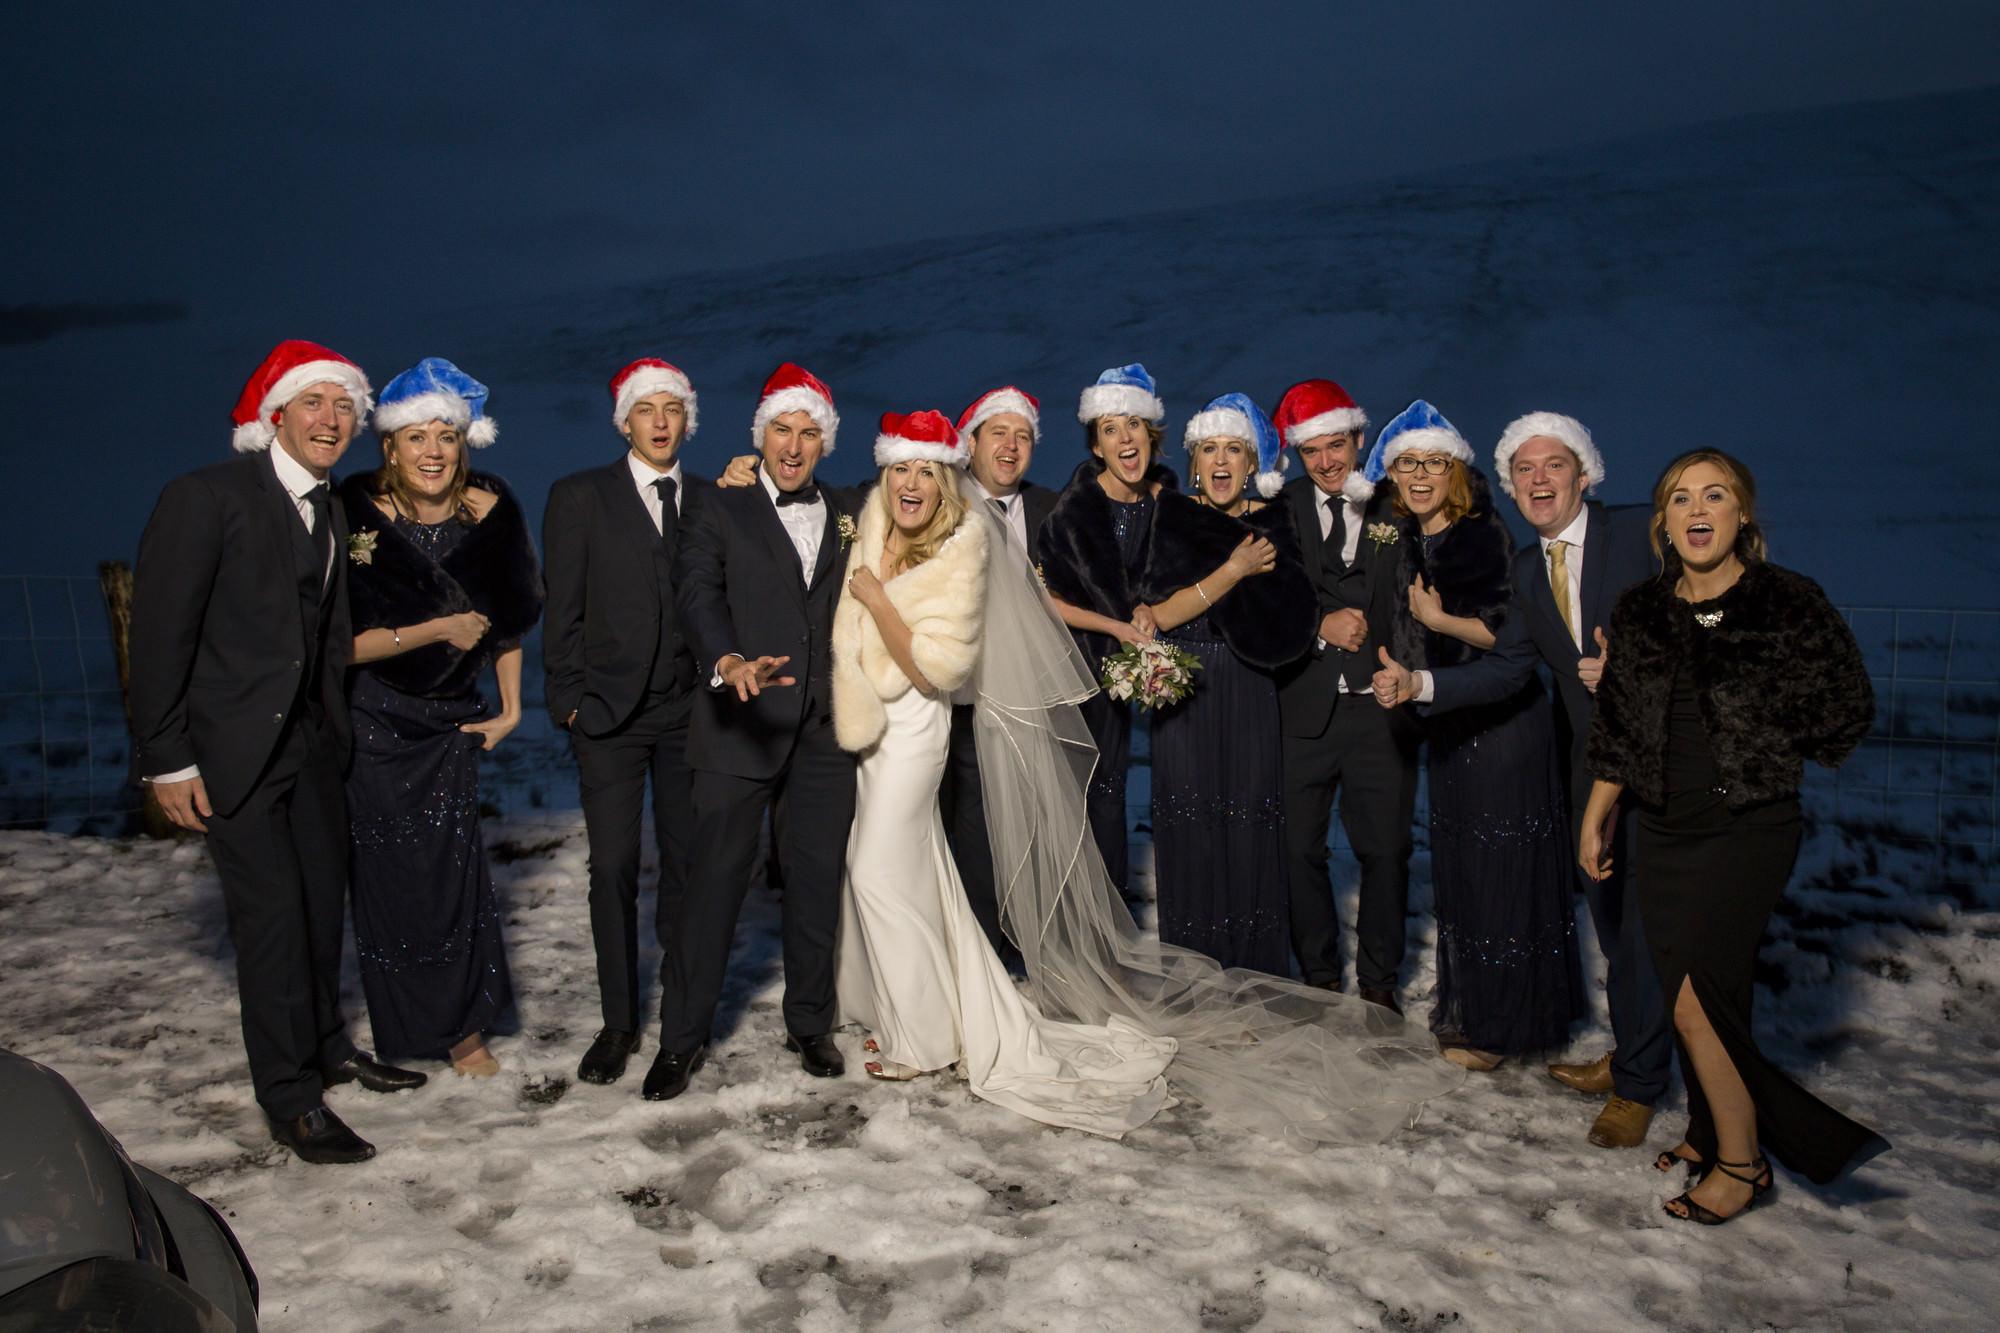 muckross_park_hotel_grougane_barra_wedding_photographer_goldenmoments_061.jpg